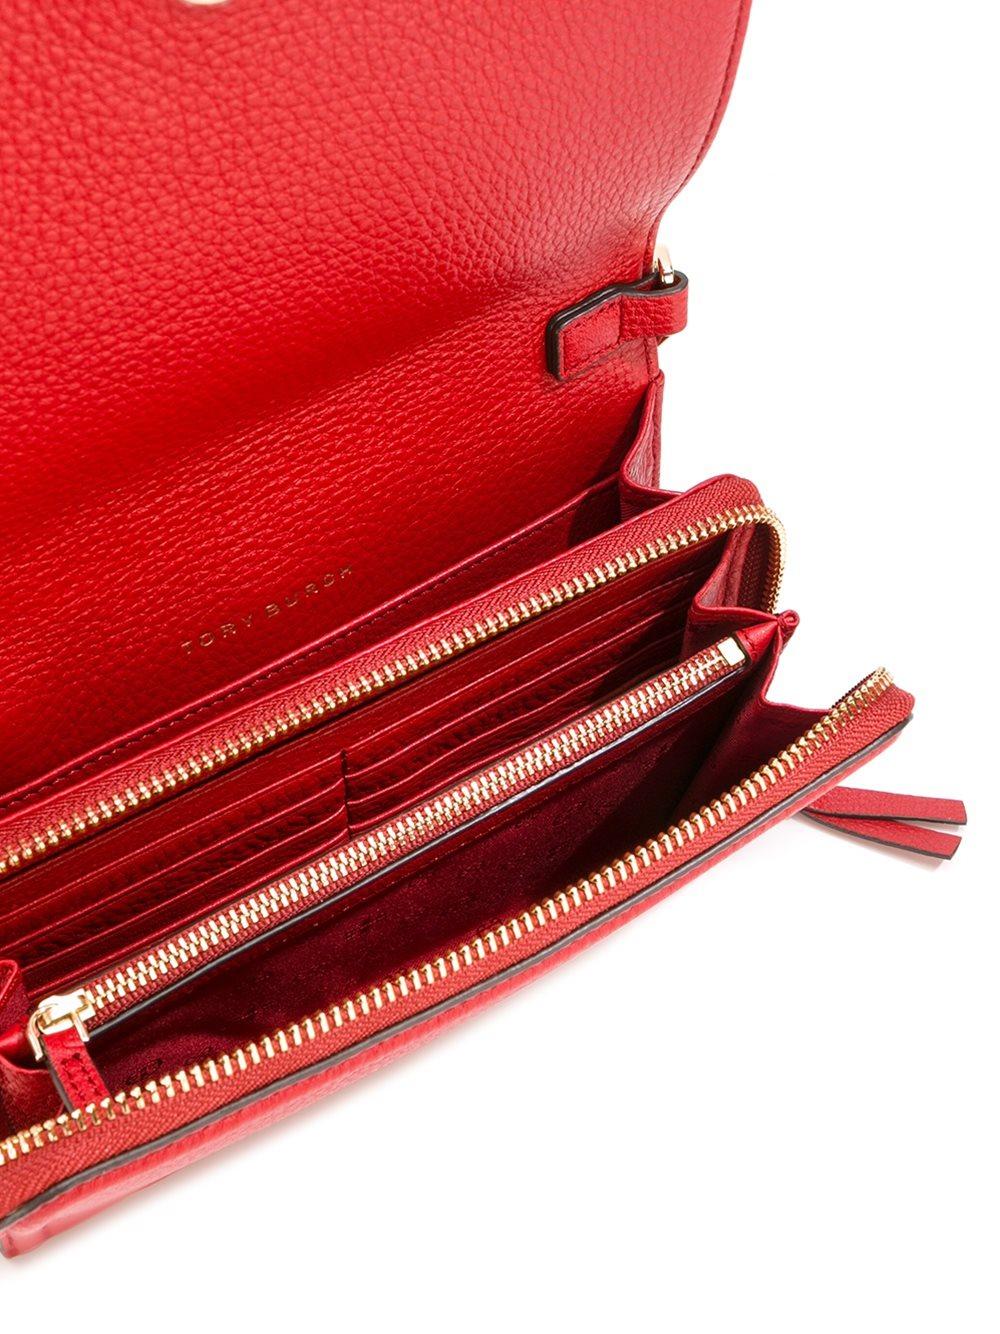 tory burch foldover crossbody bag in red lyst